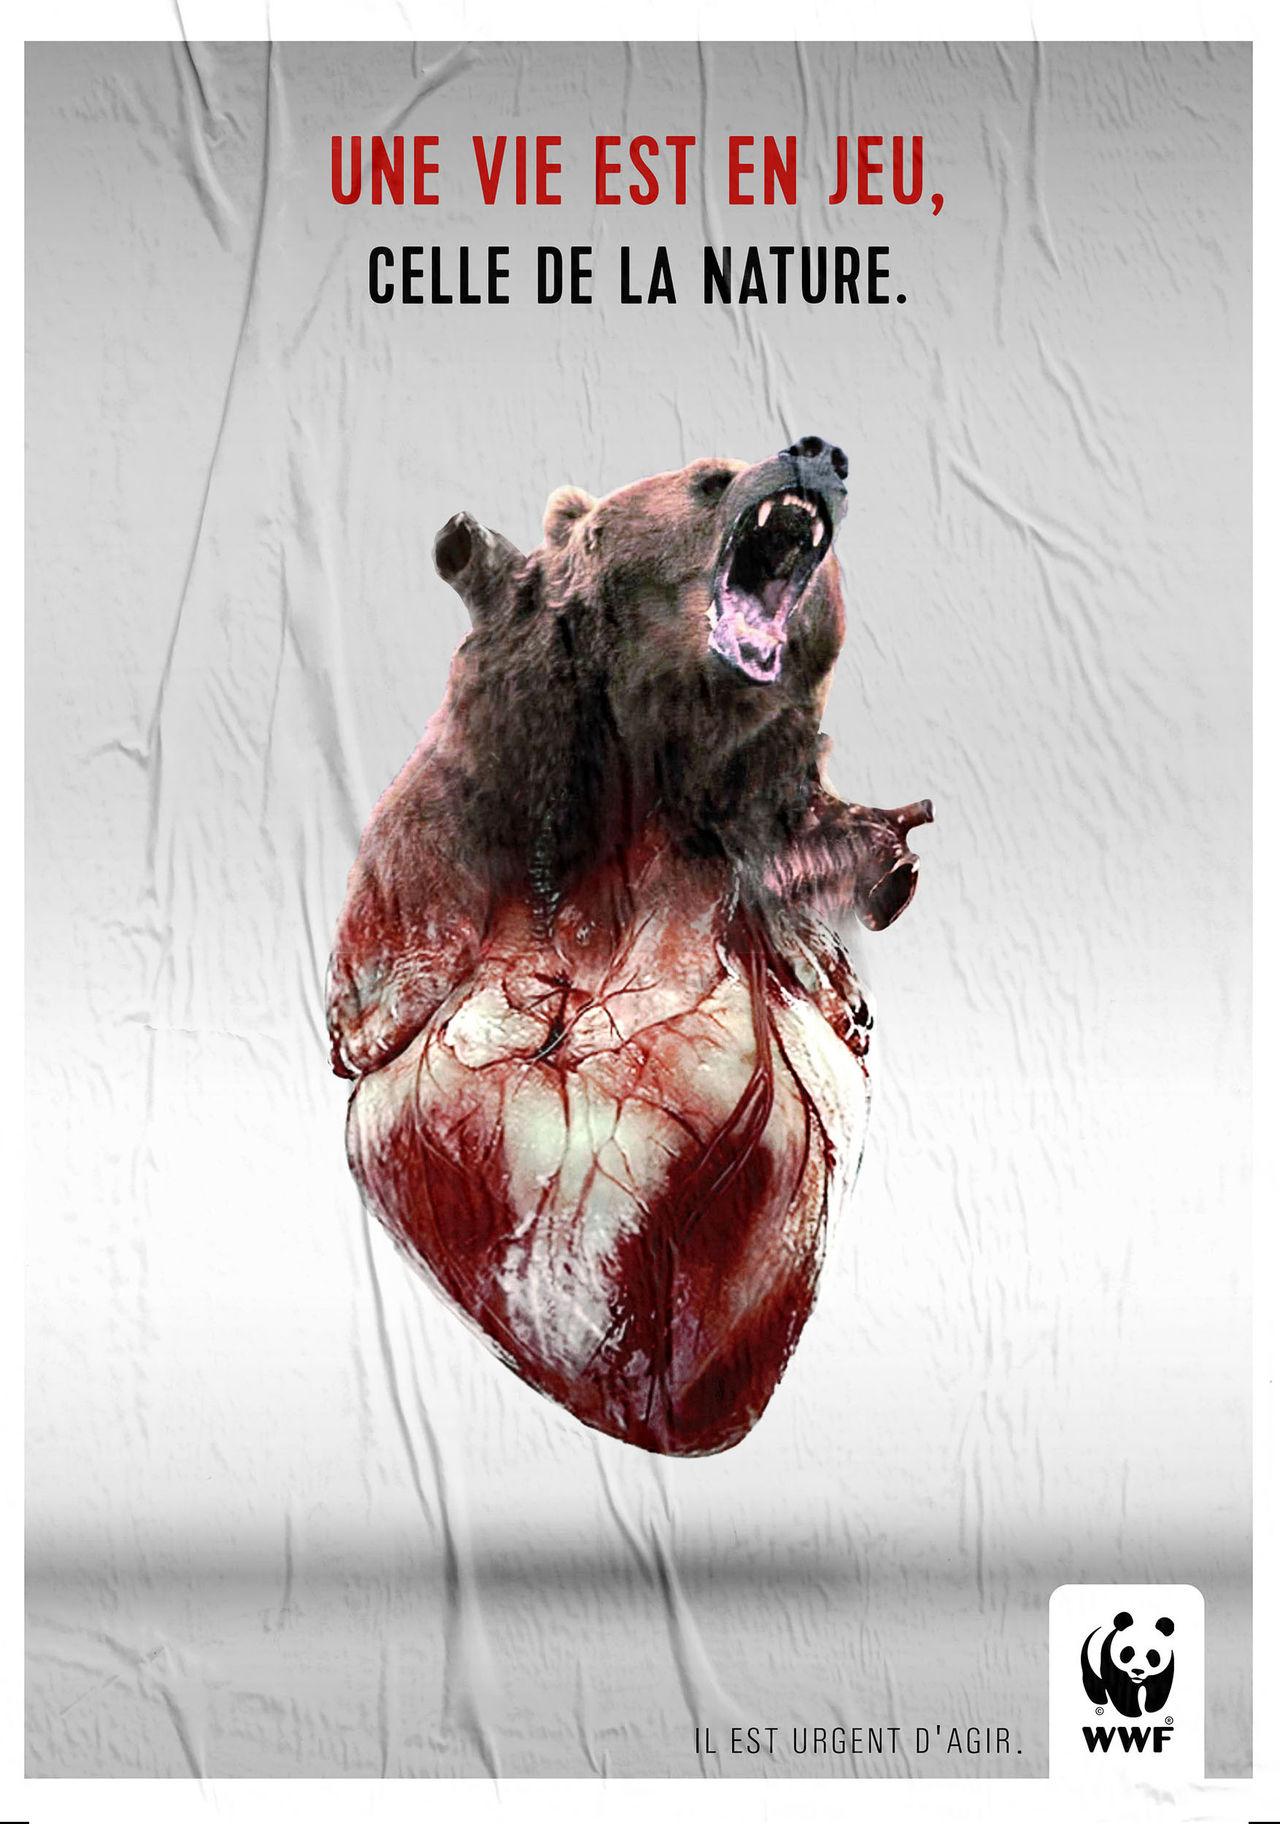 Campagne publicitaire WWF